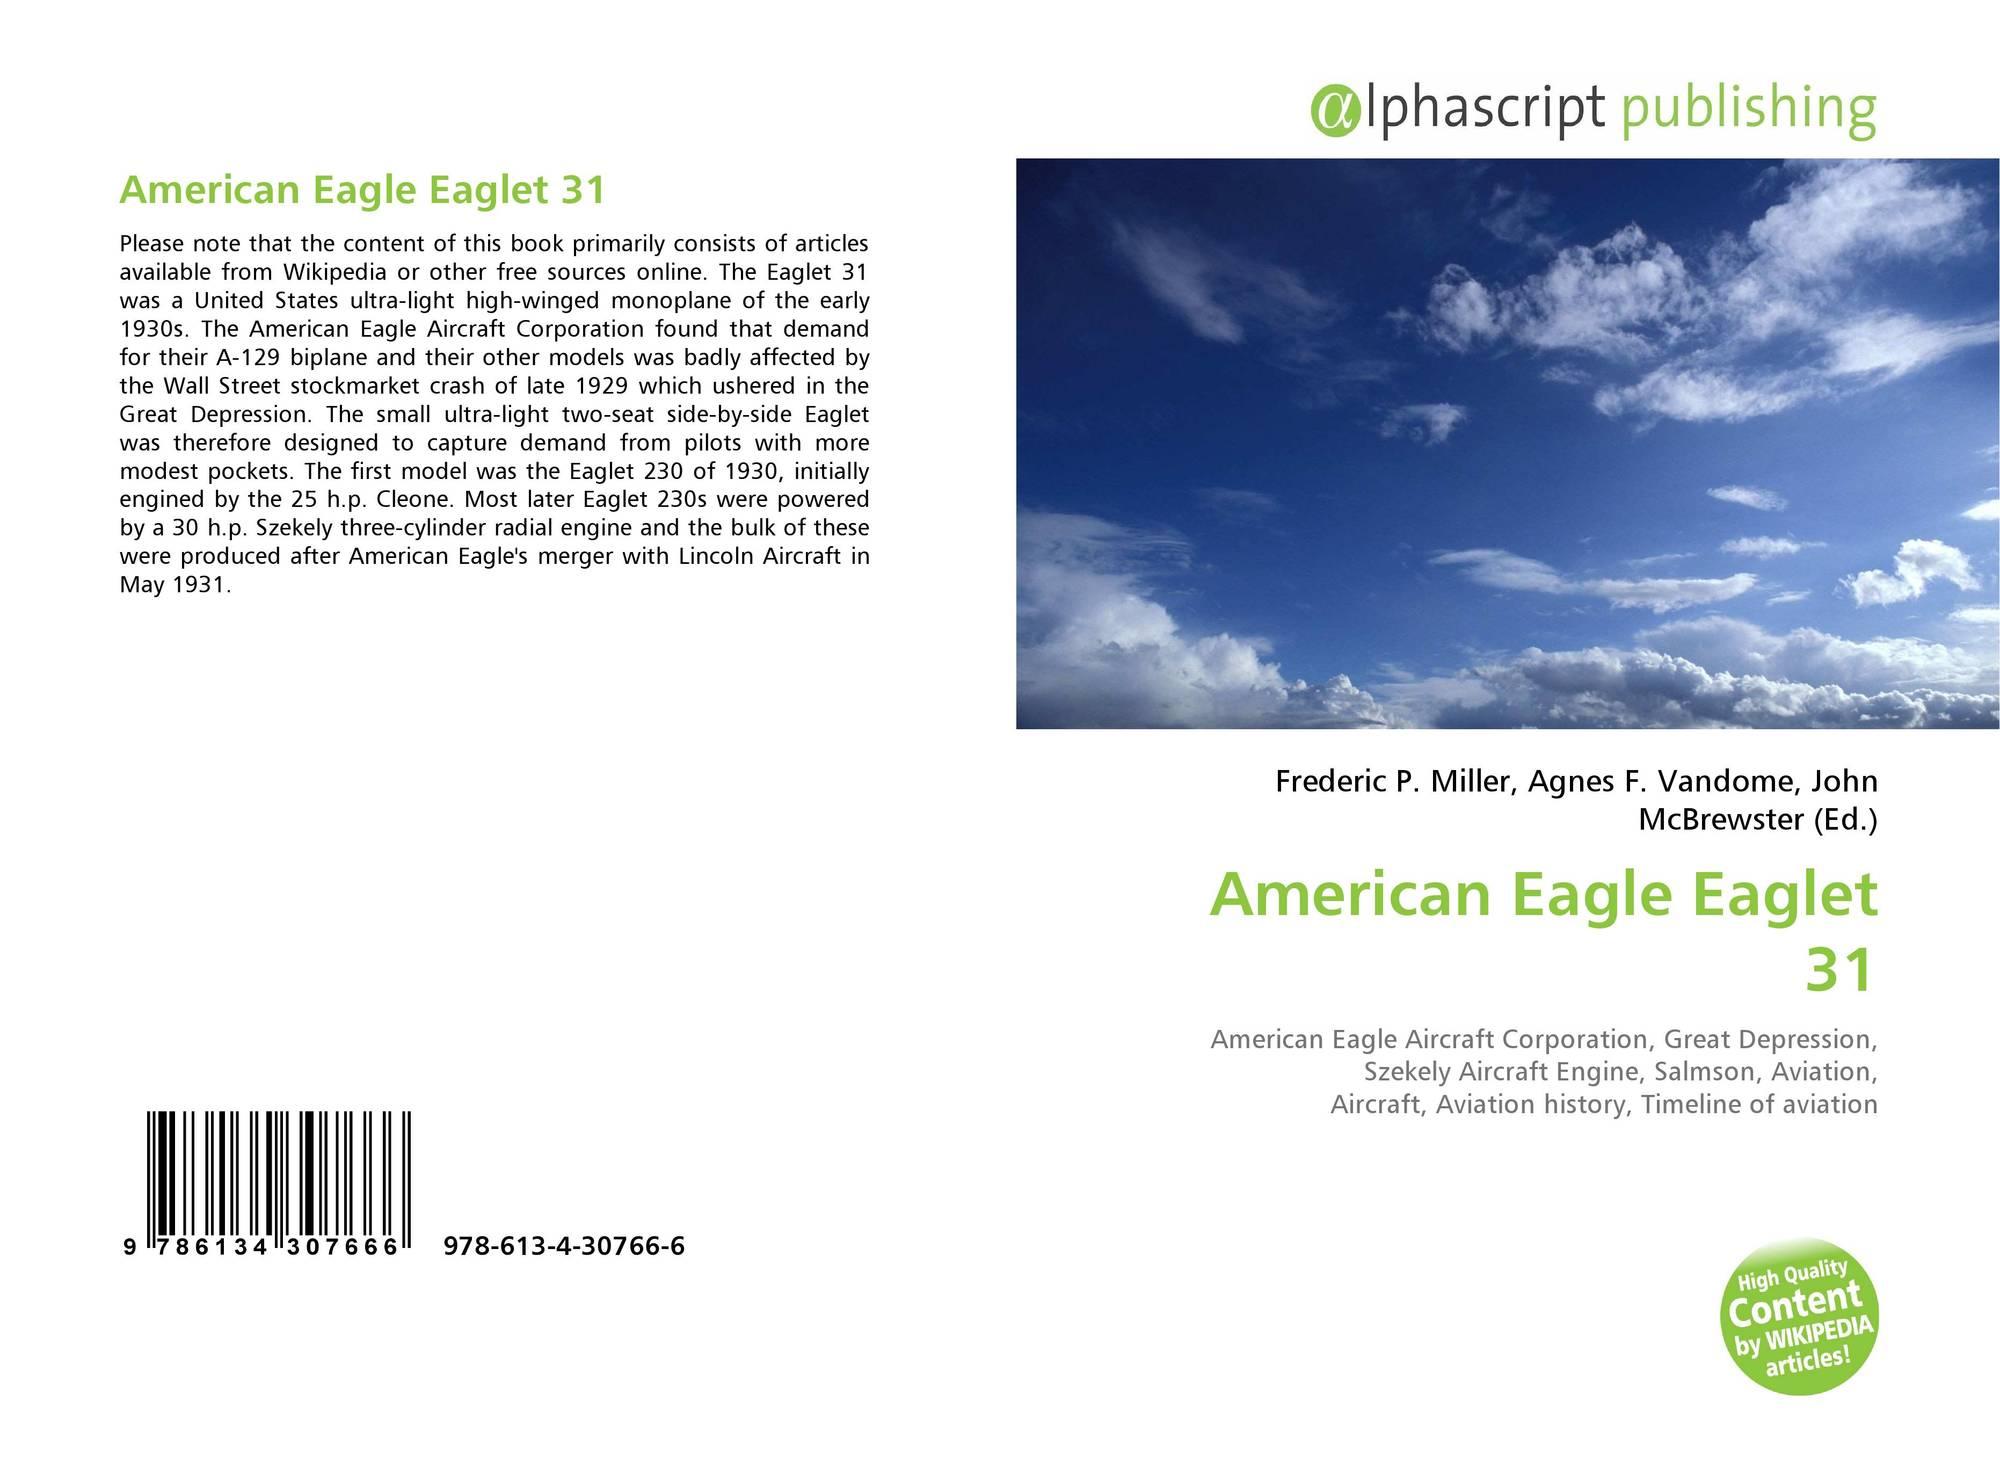 American Eagle Eaglet 31, 978-613-4-30766-6, 6134307661